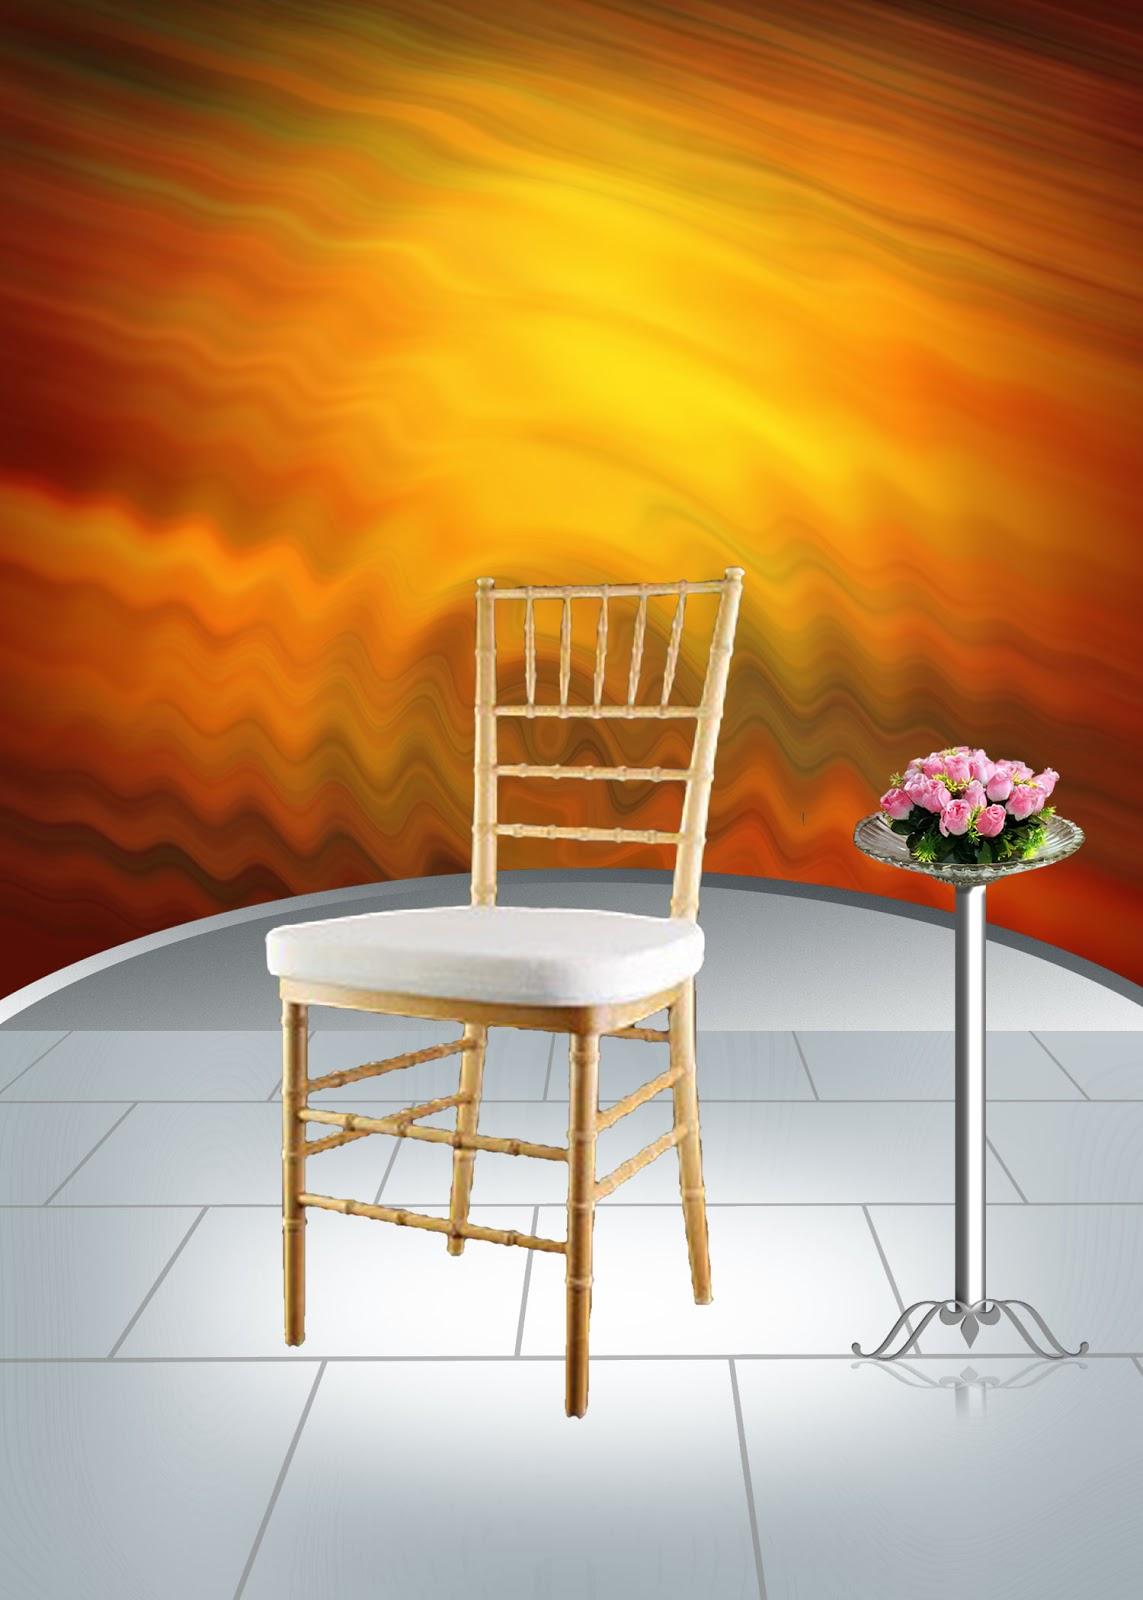 Background Images For Photo Studio Studio Background Psd ...